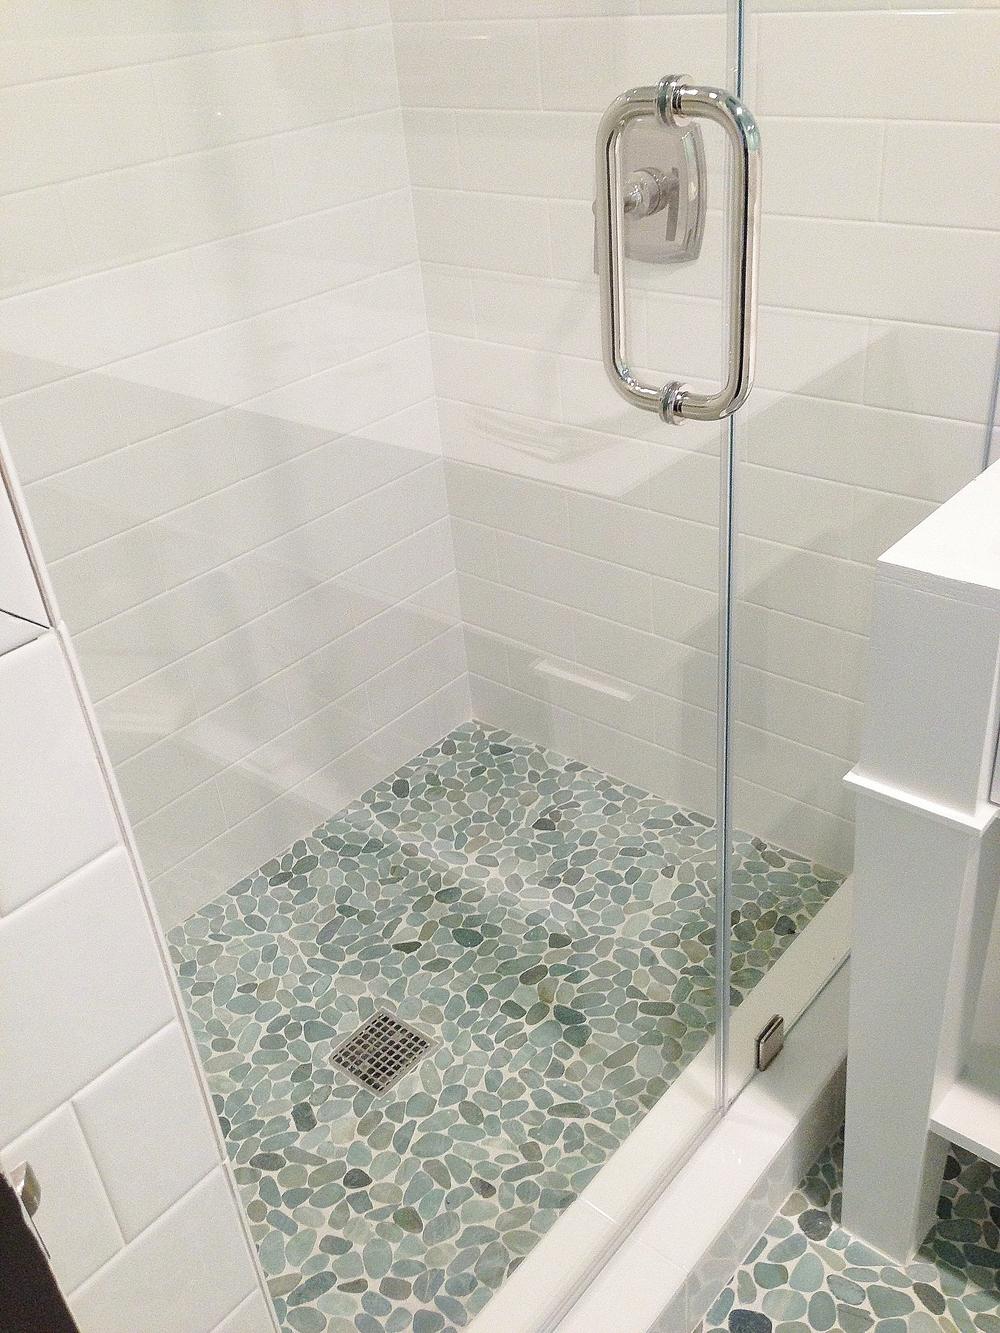 10 Of My Best Bathroom Design Tips! — DESIGNED